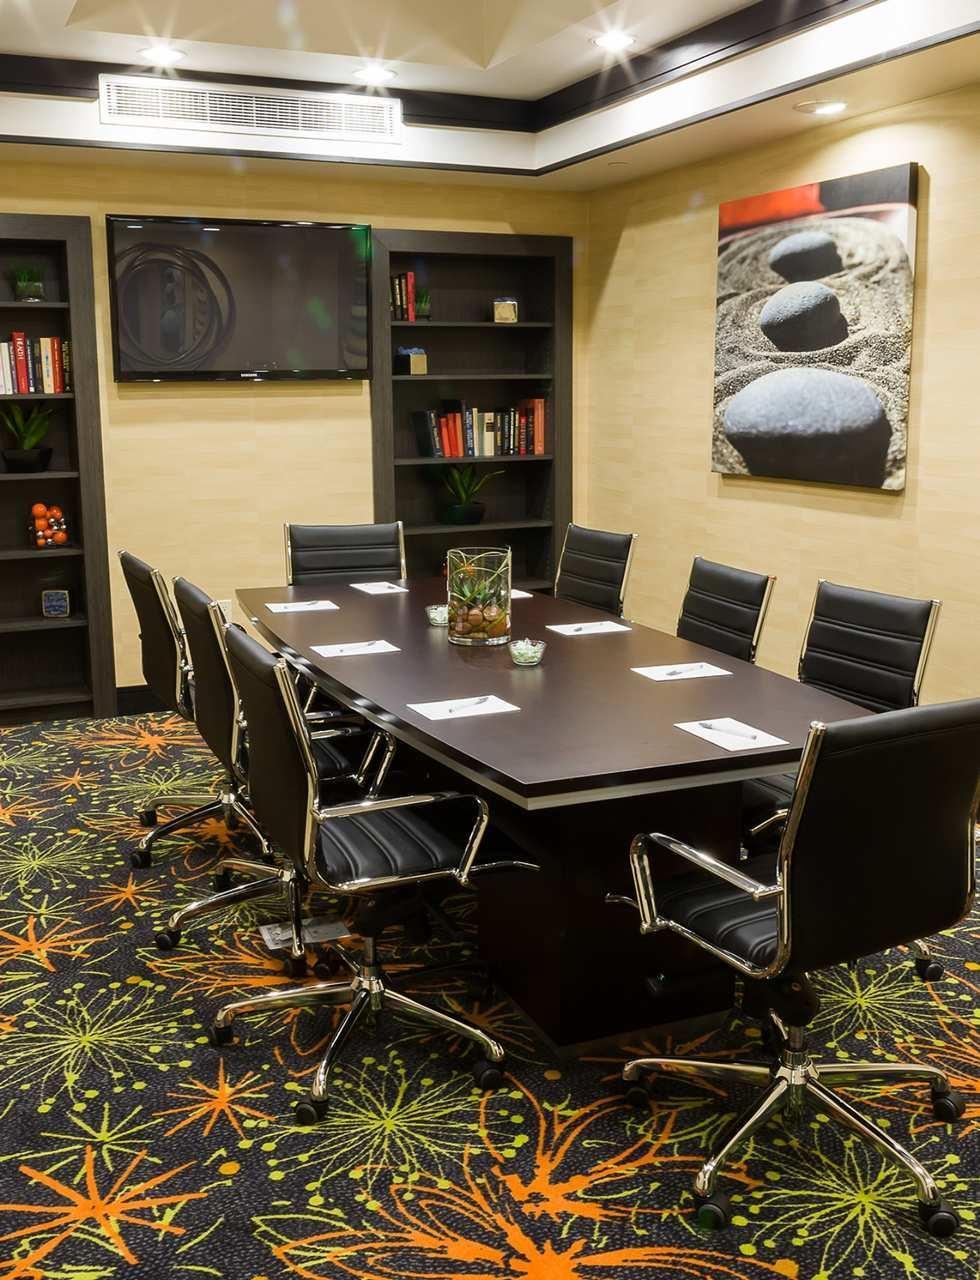 Hampton Inn & Suites Tulsa/Central image 19